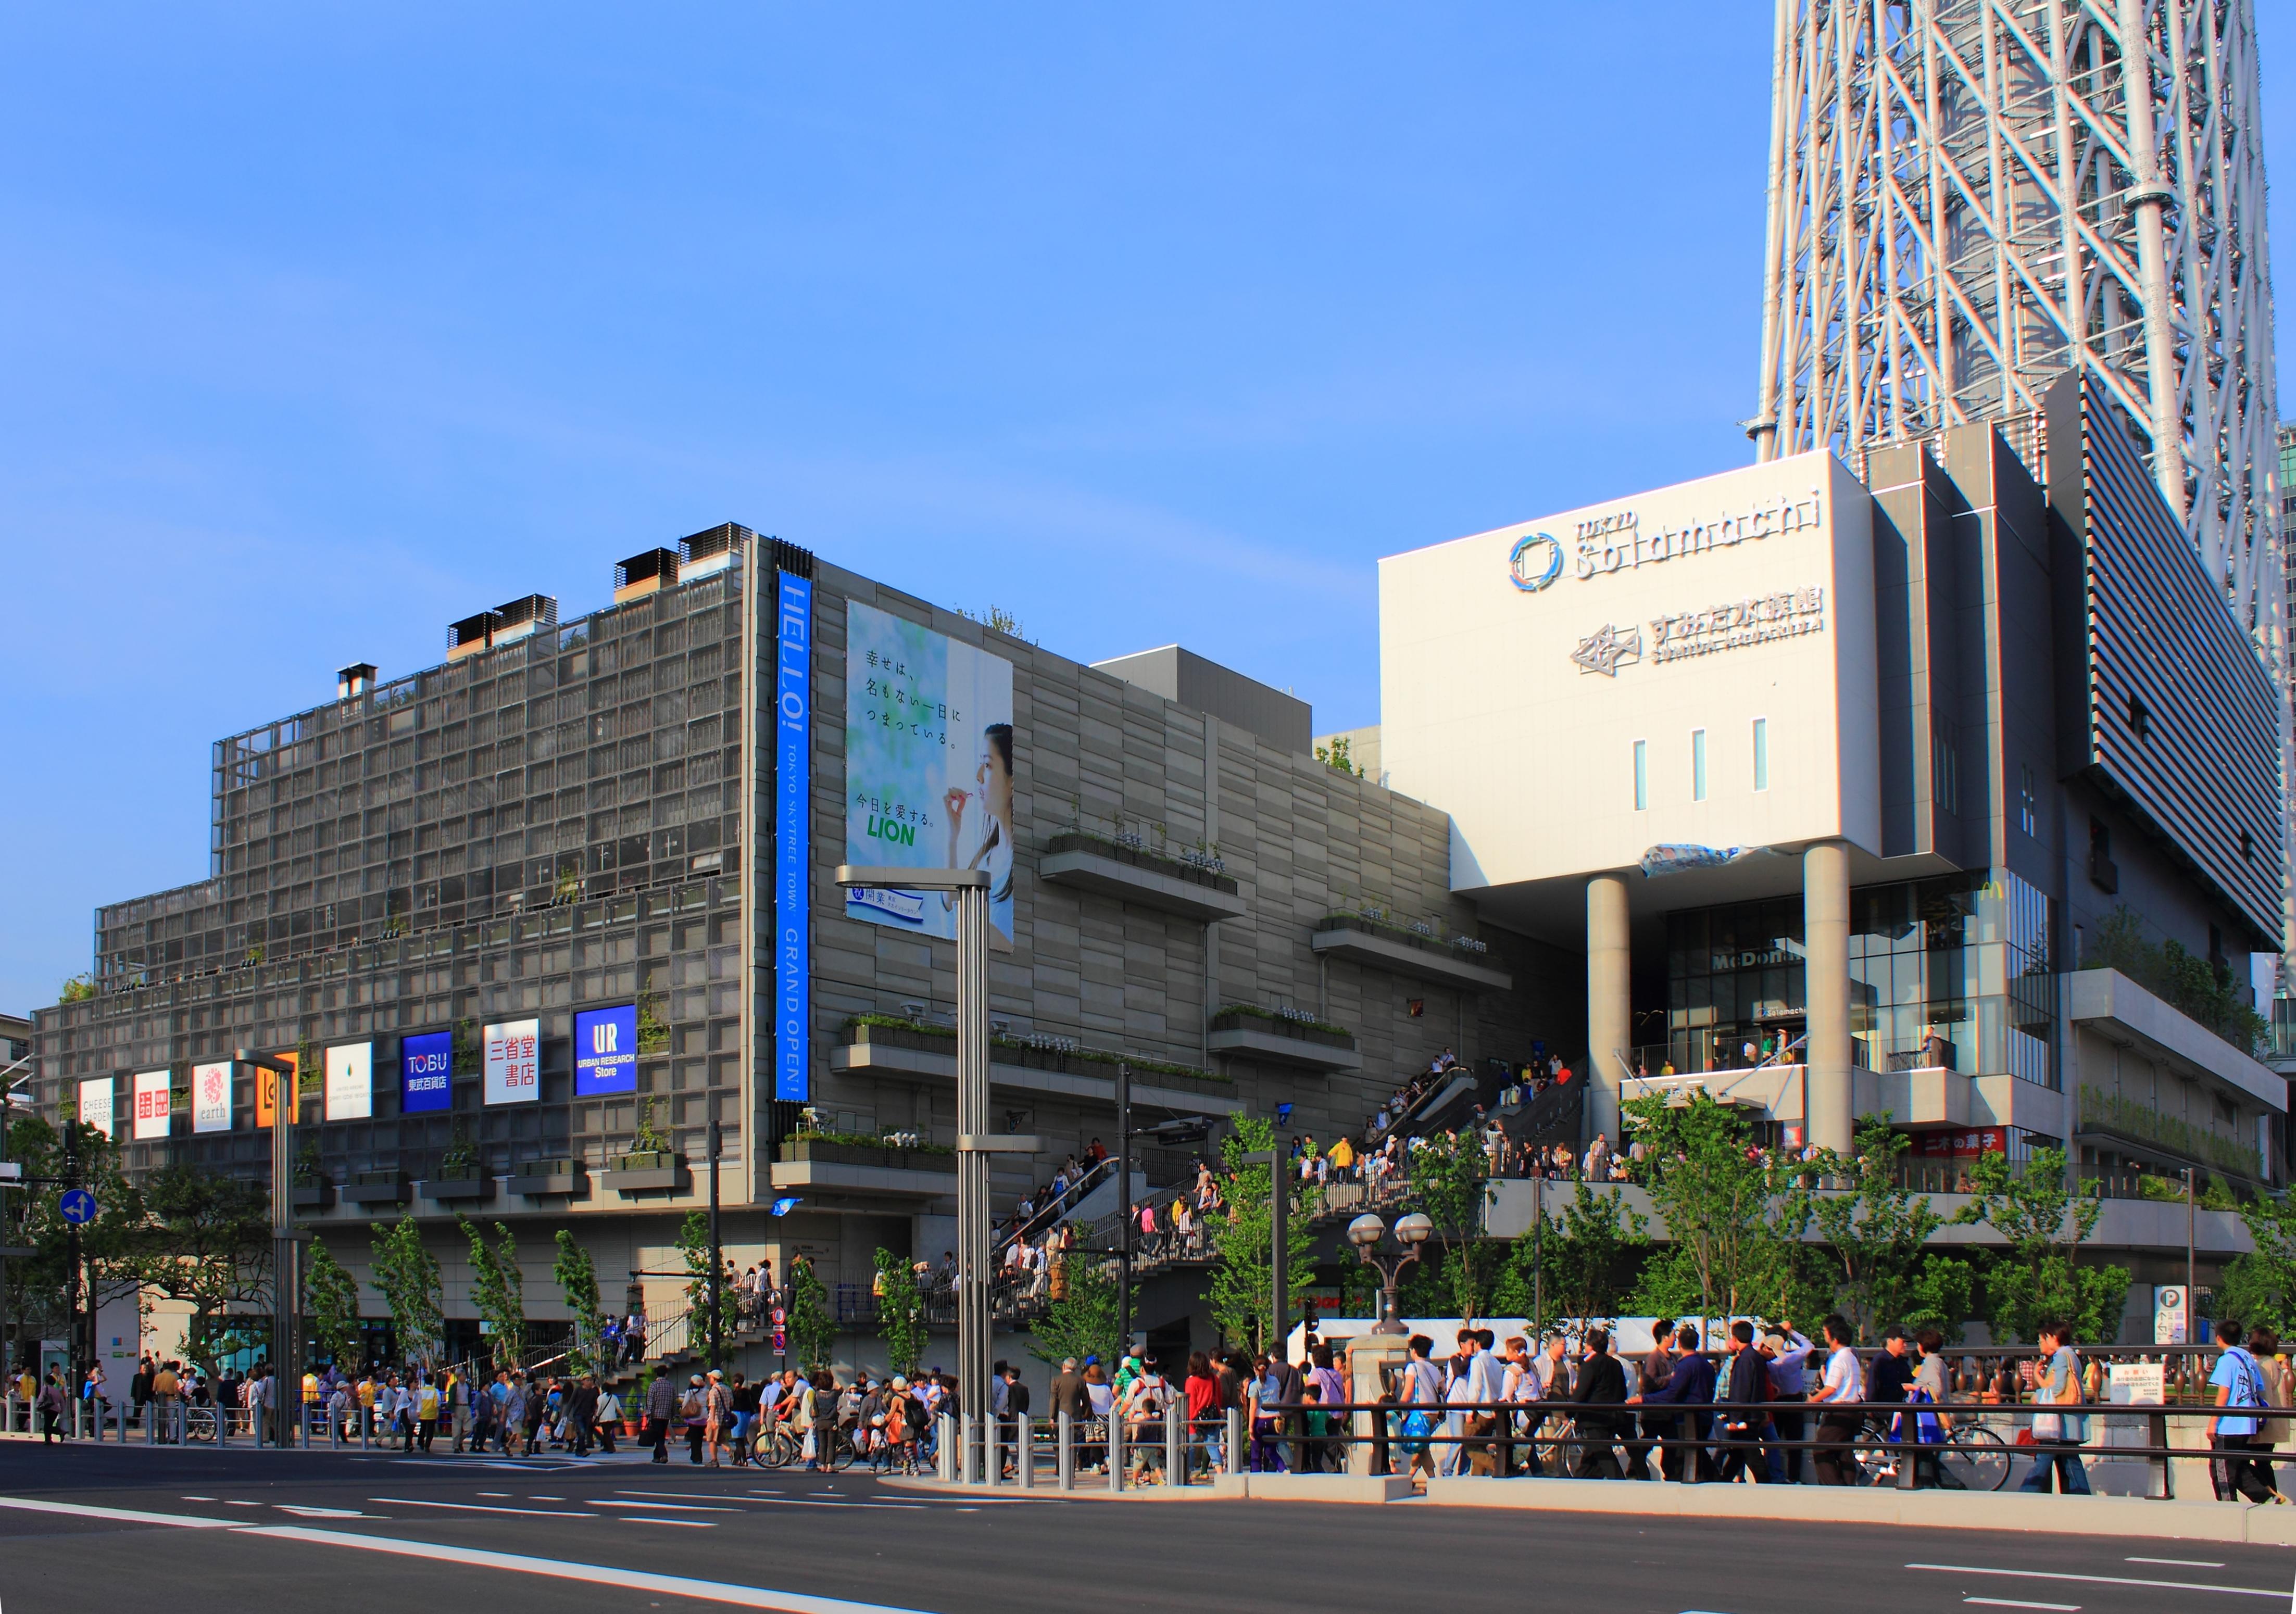 Tokyo soramachi 2012